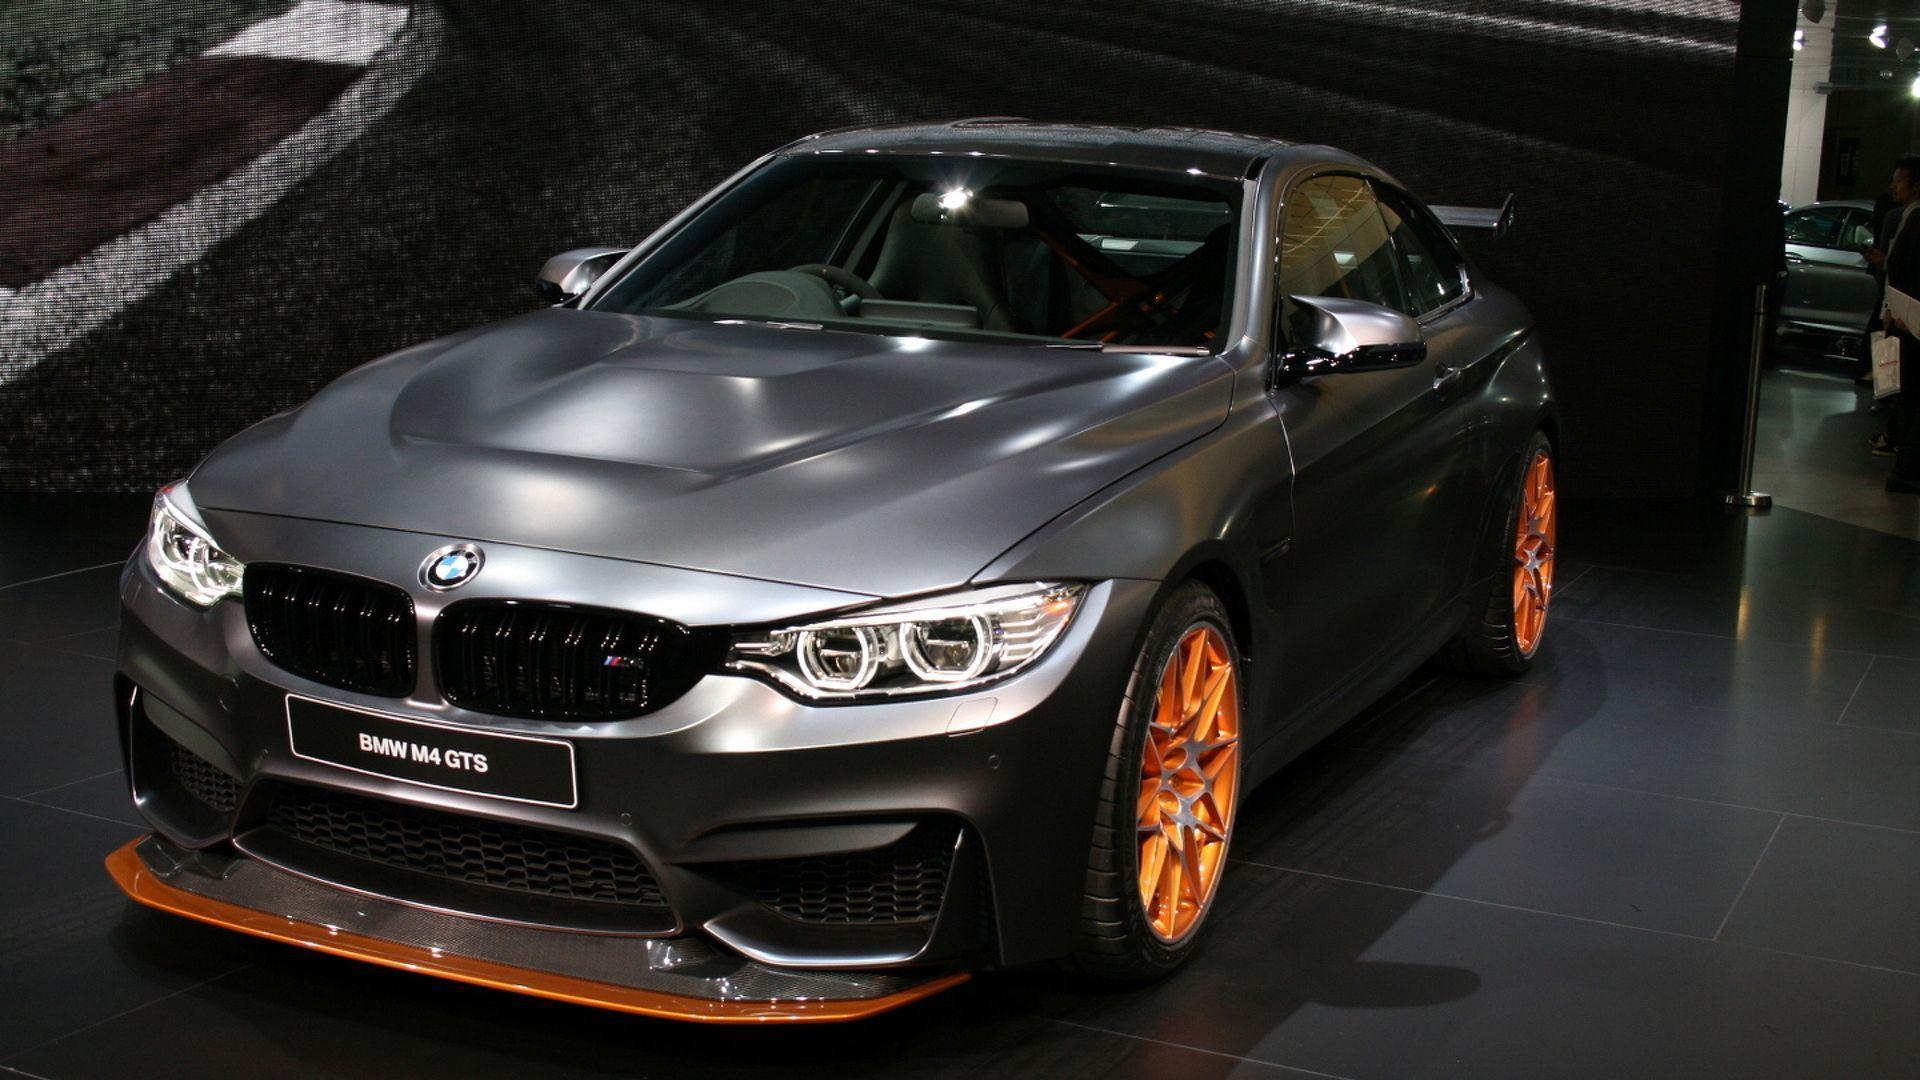 2020 Bmw M4 Gts Price